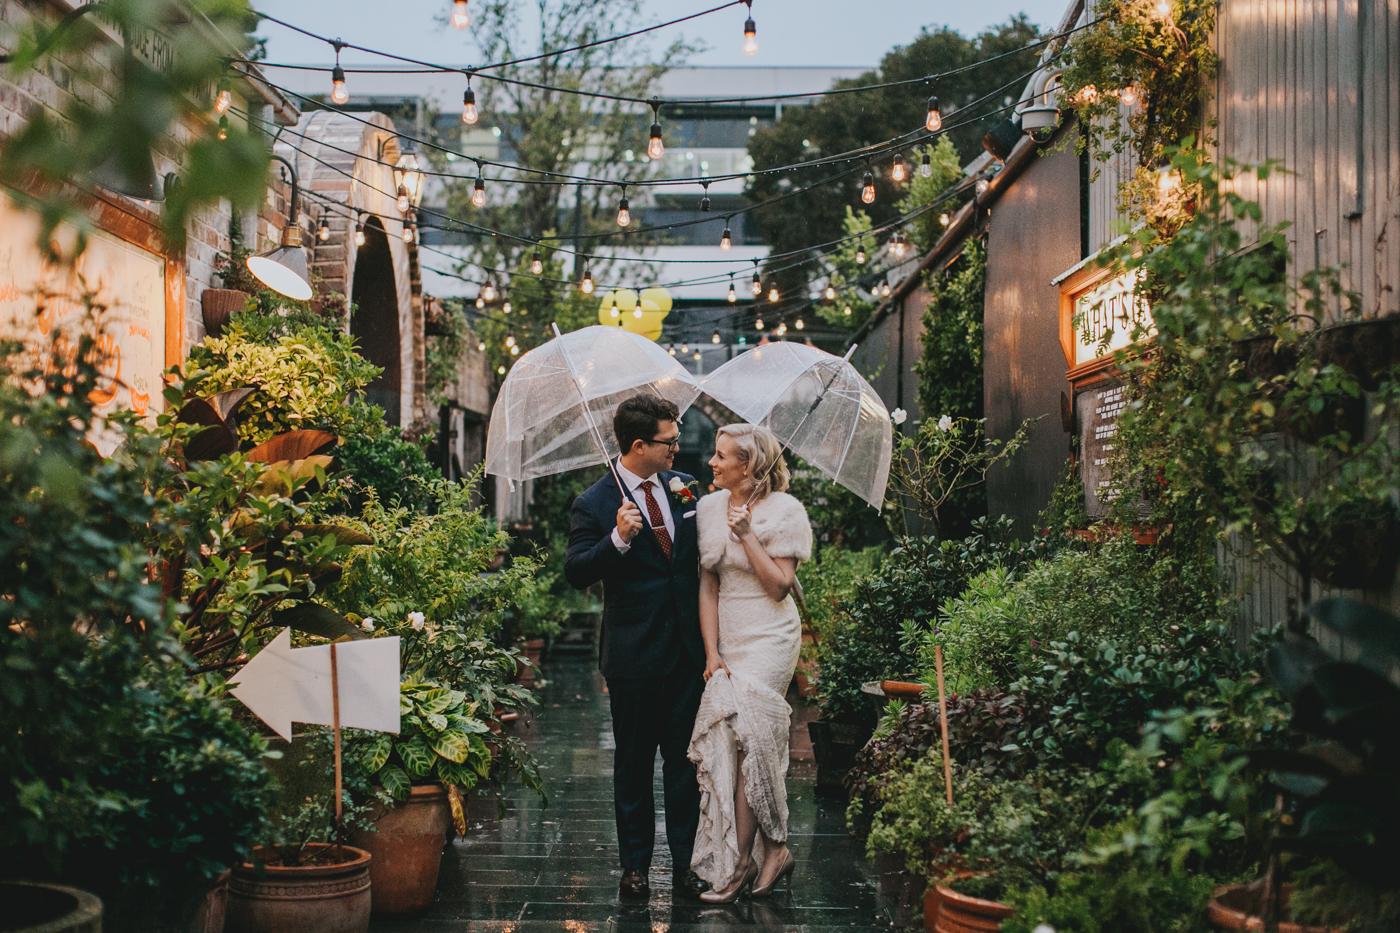 Jo & Tom Wedding - The Grounds of Alexandria - Samantha Heather Photography-251.jpg